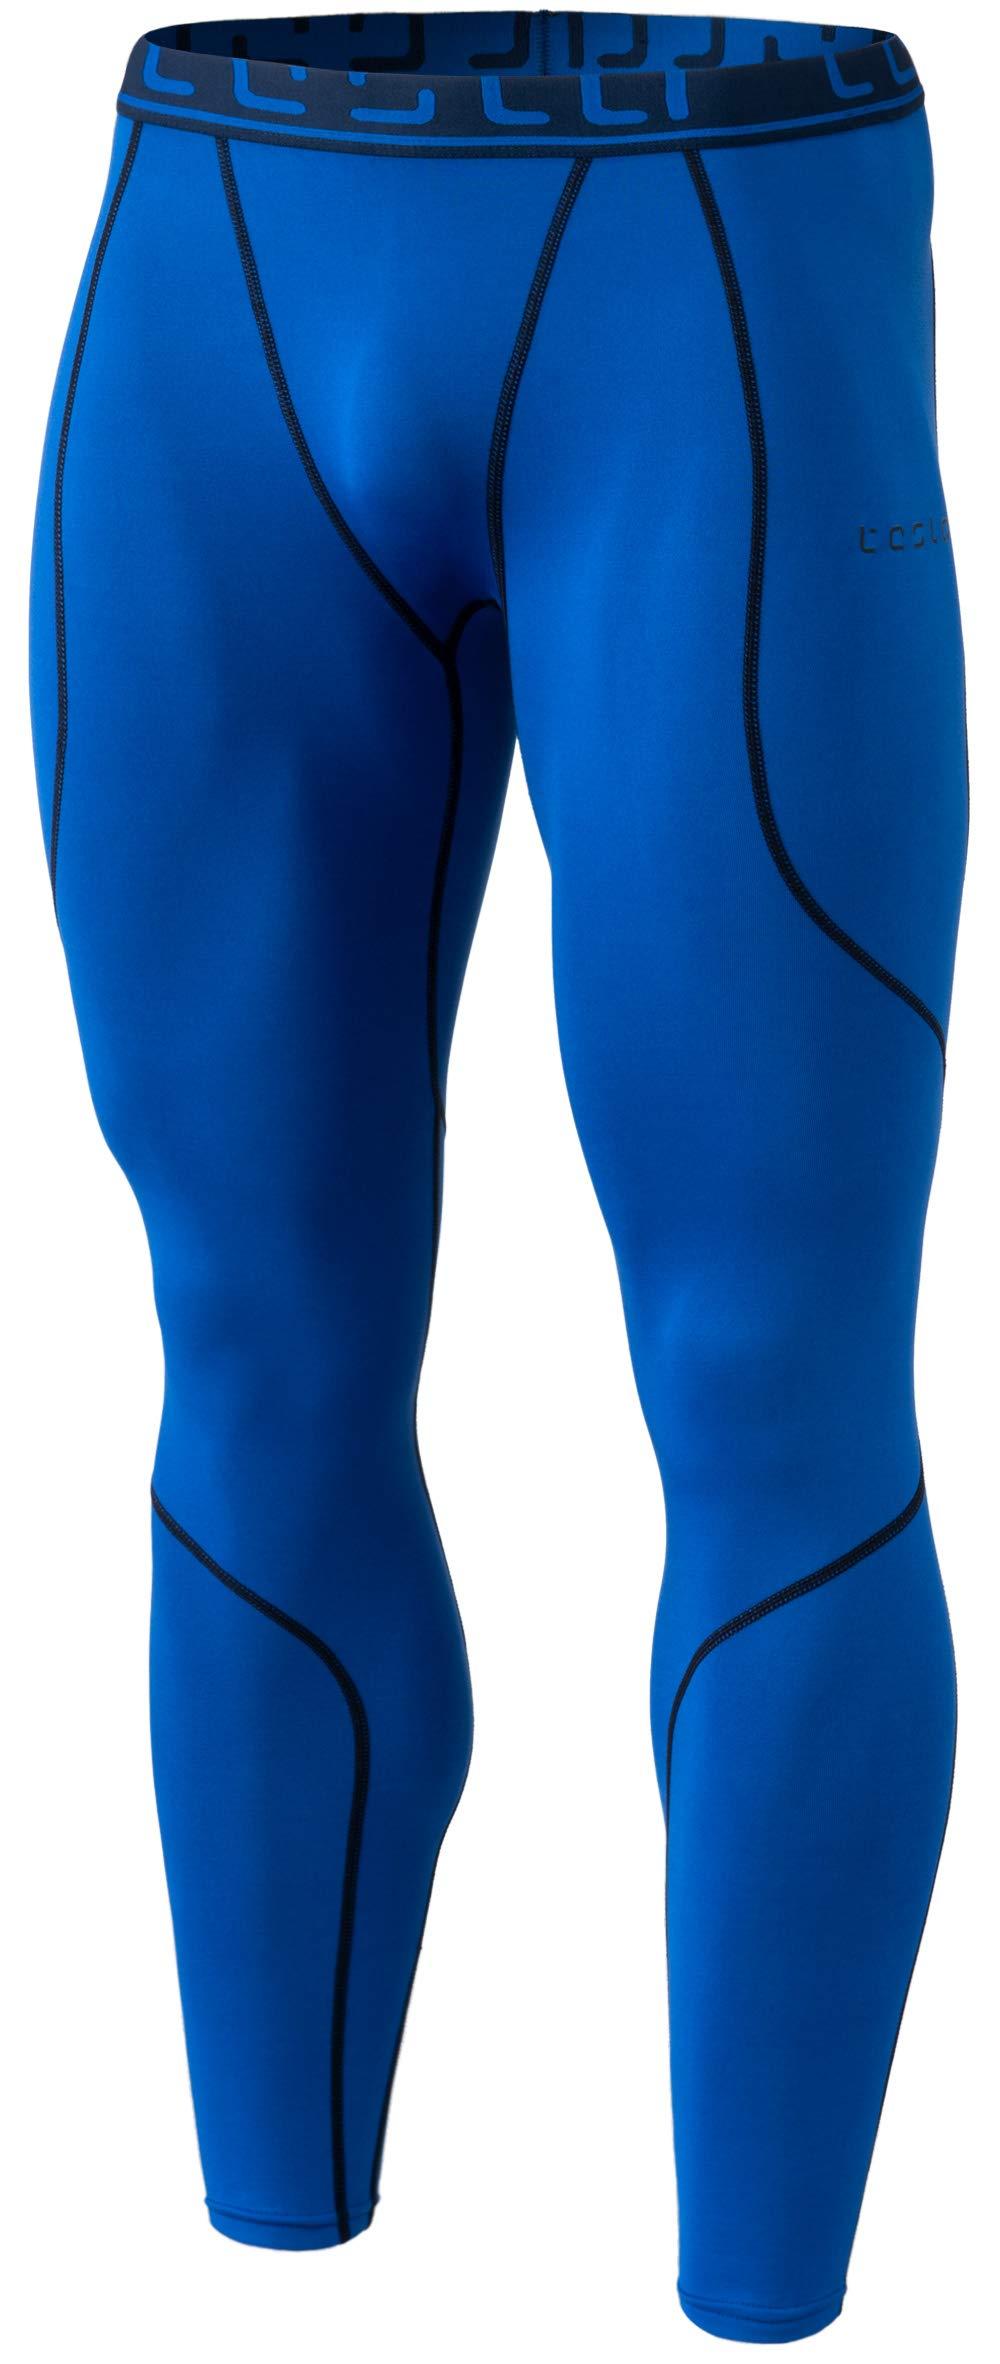 TSLA TM-YUP43-BLU_X-Small Men's Emboss Pants